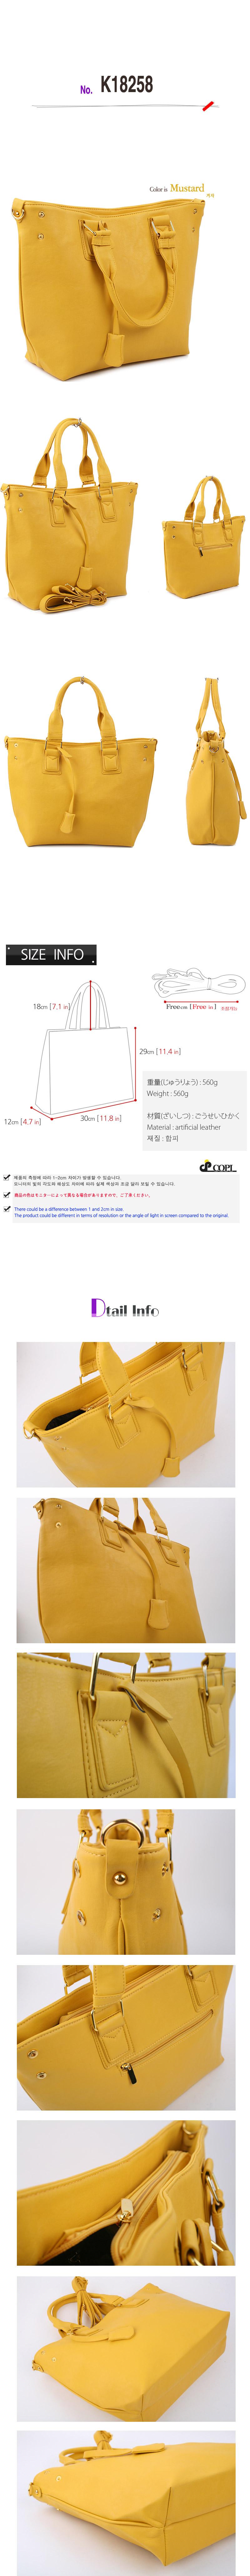 Shoulder&tote bag no.K18258view